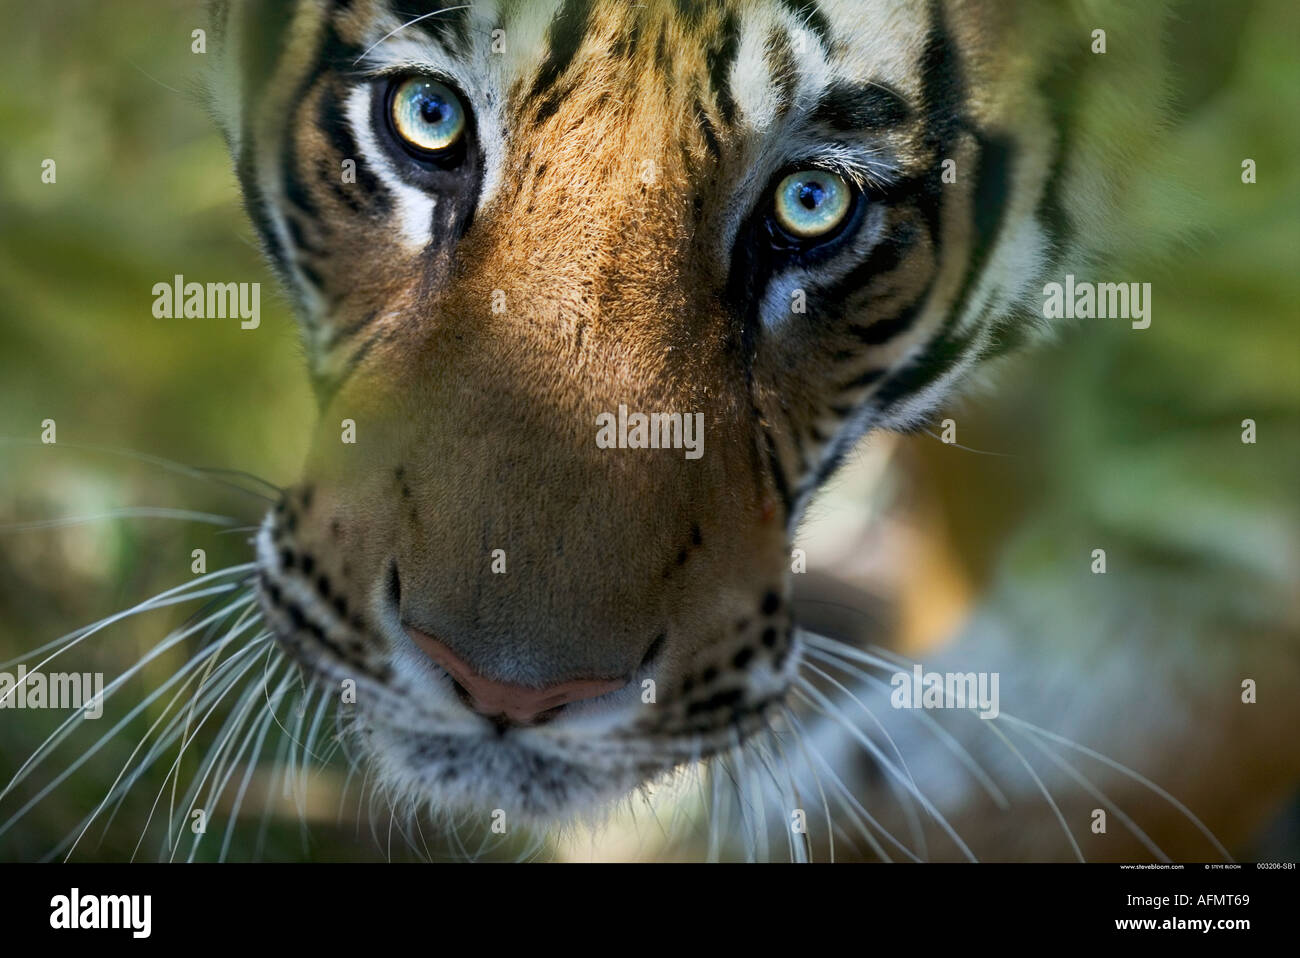 Tigre de Bengala olhando Bandhavgarh Índia Imagens de Stock